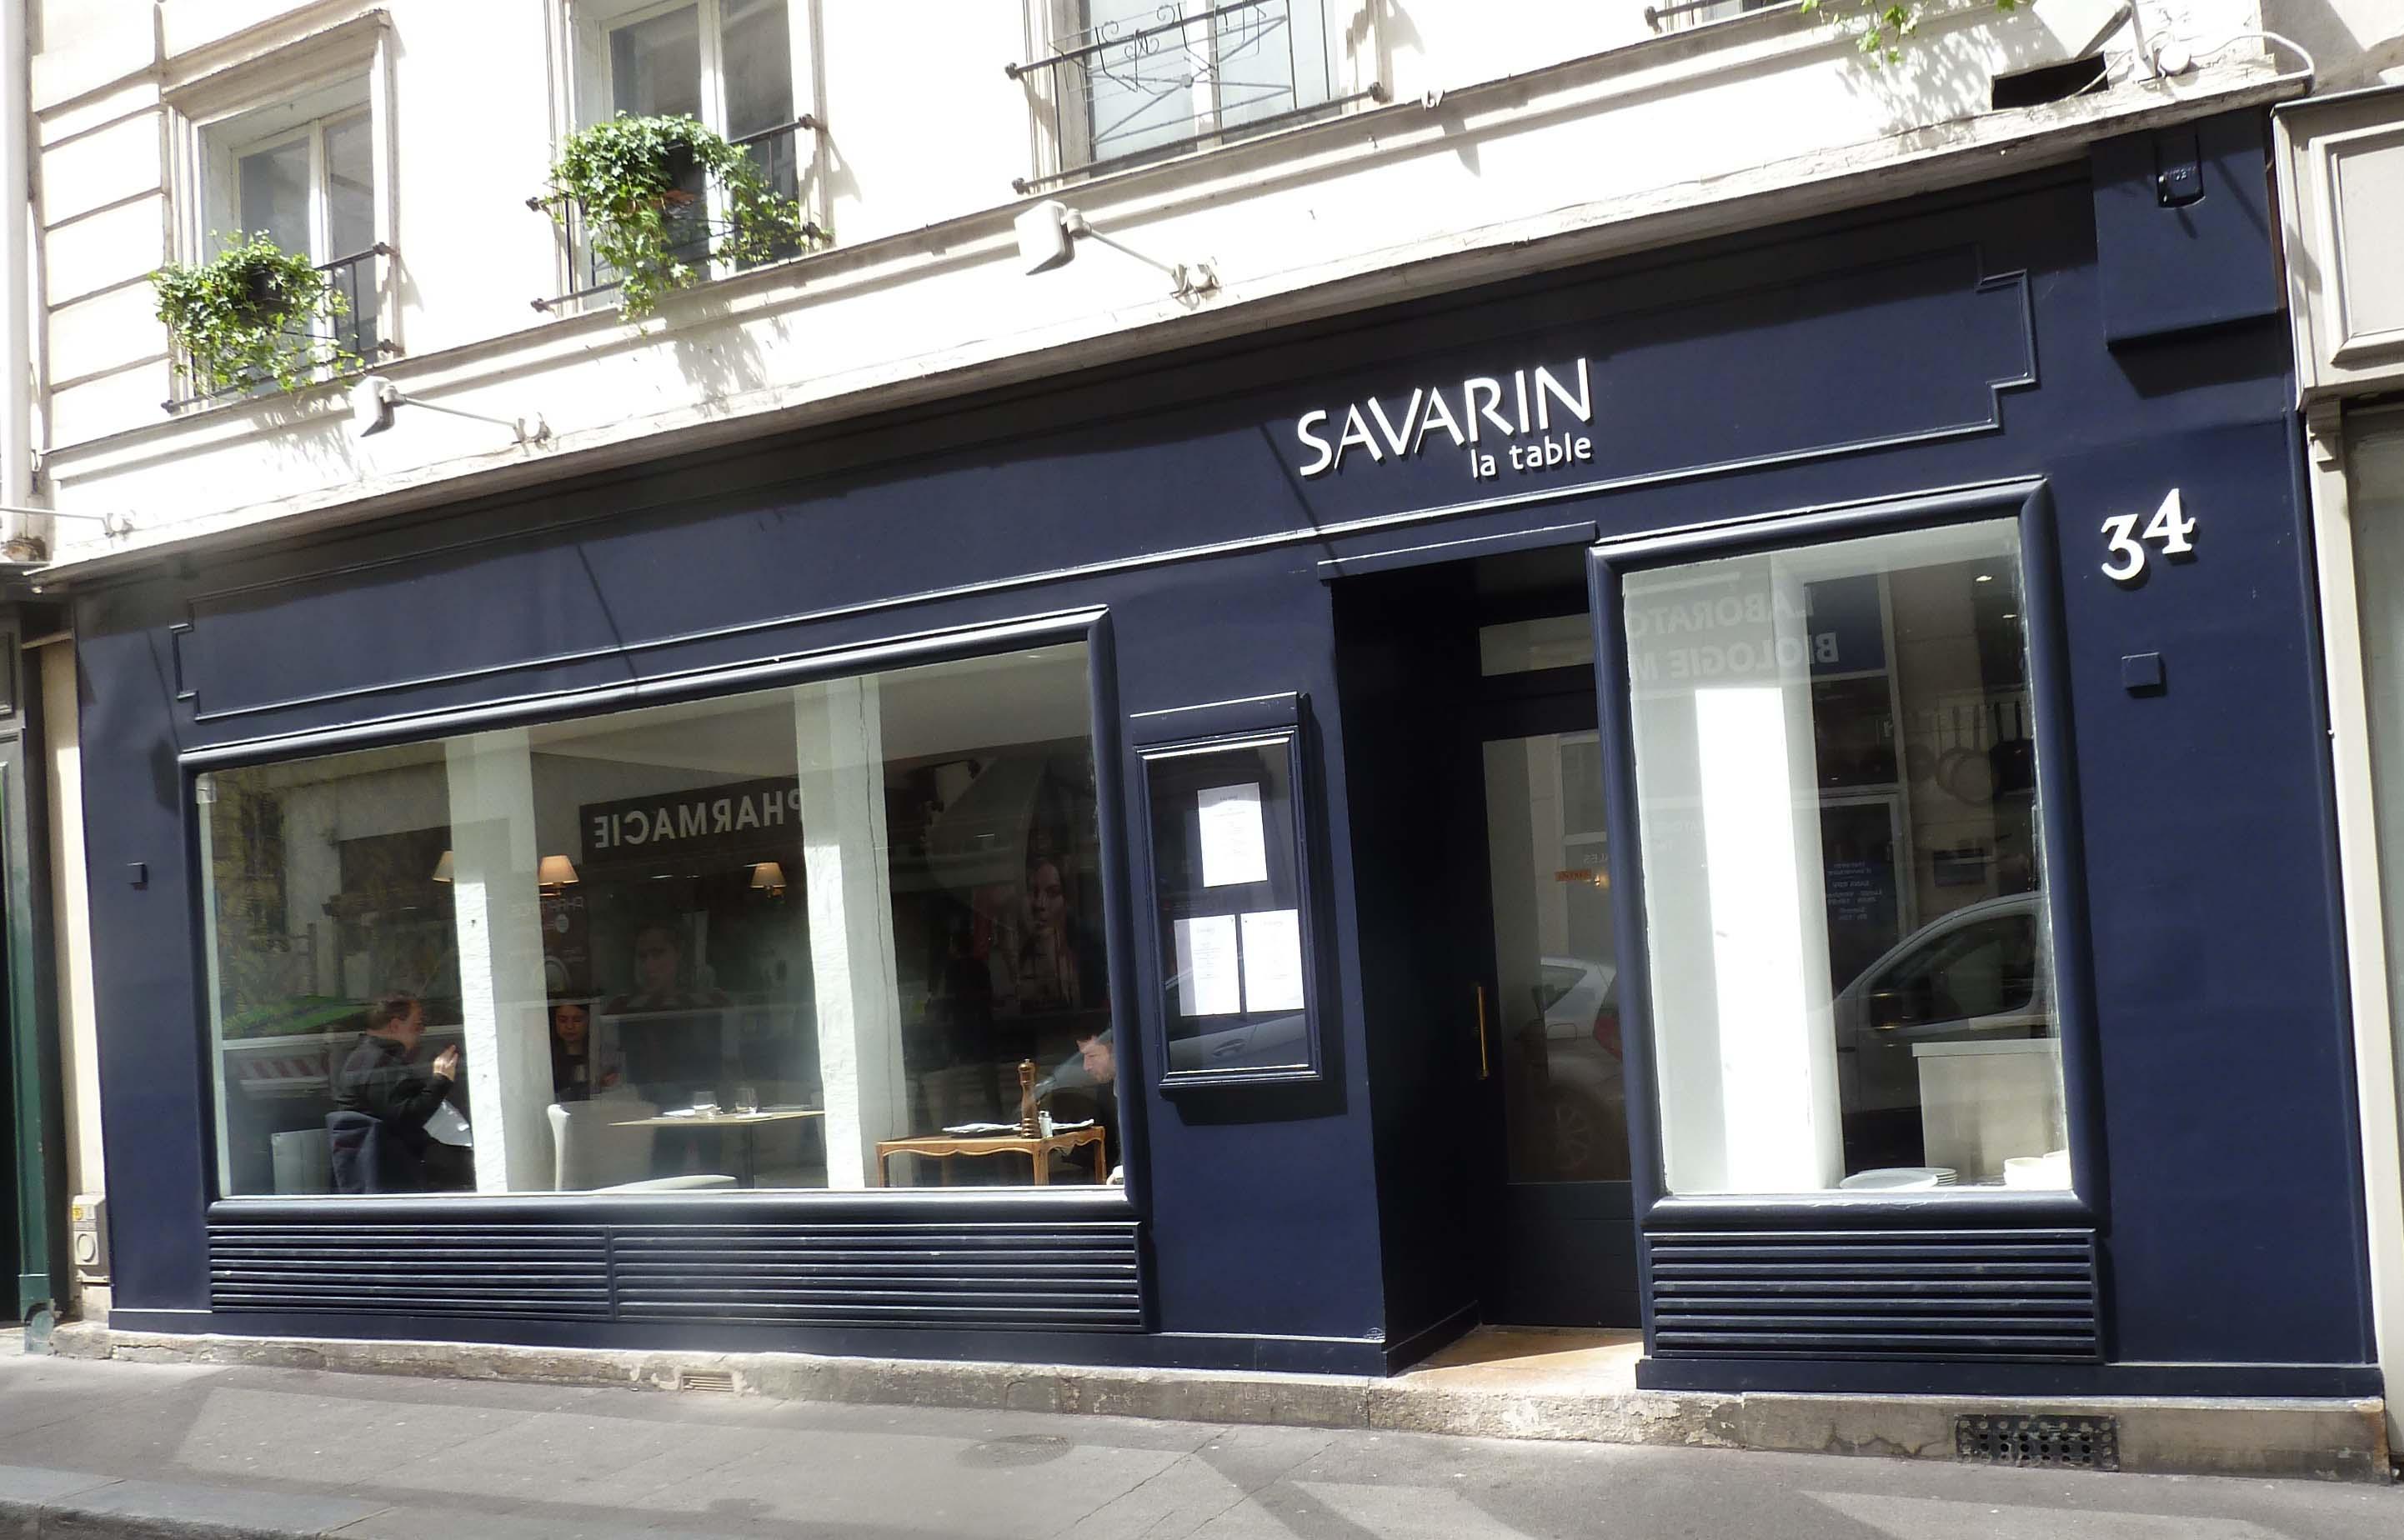 John Talbott S Paris Savarin La Table In The 7th Another Keeper